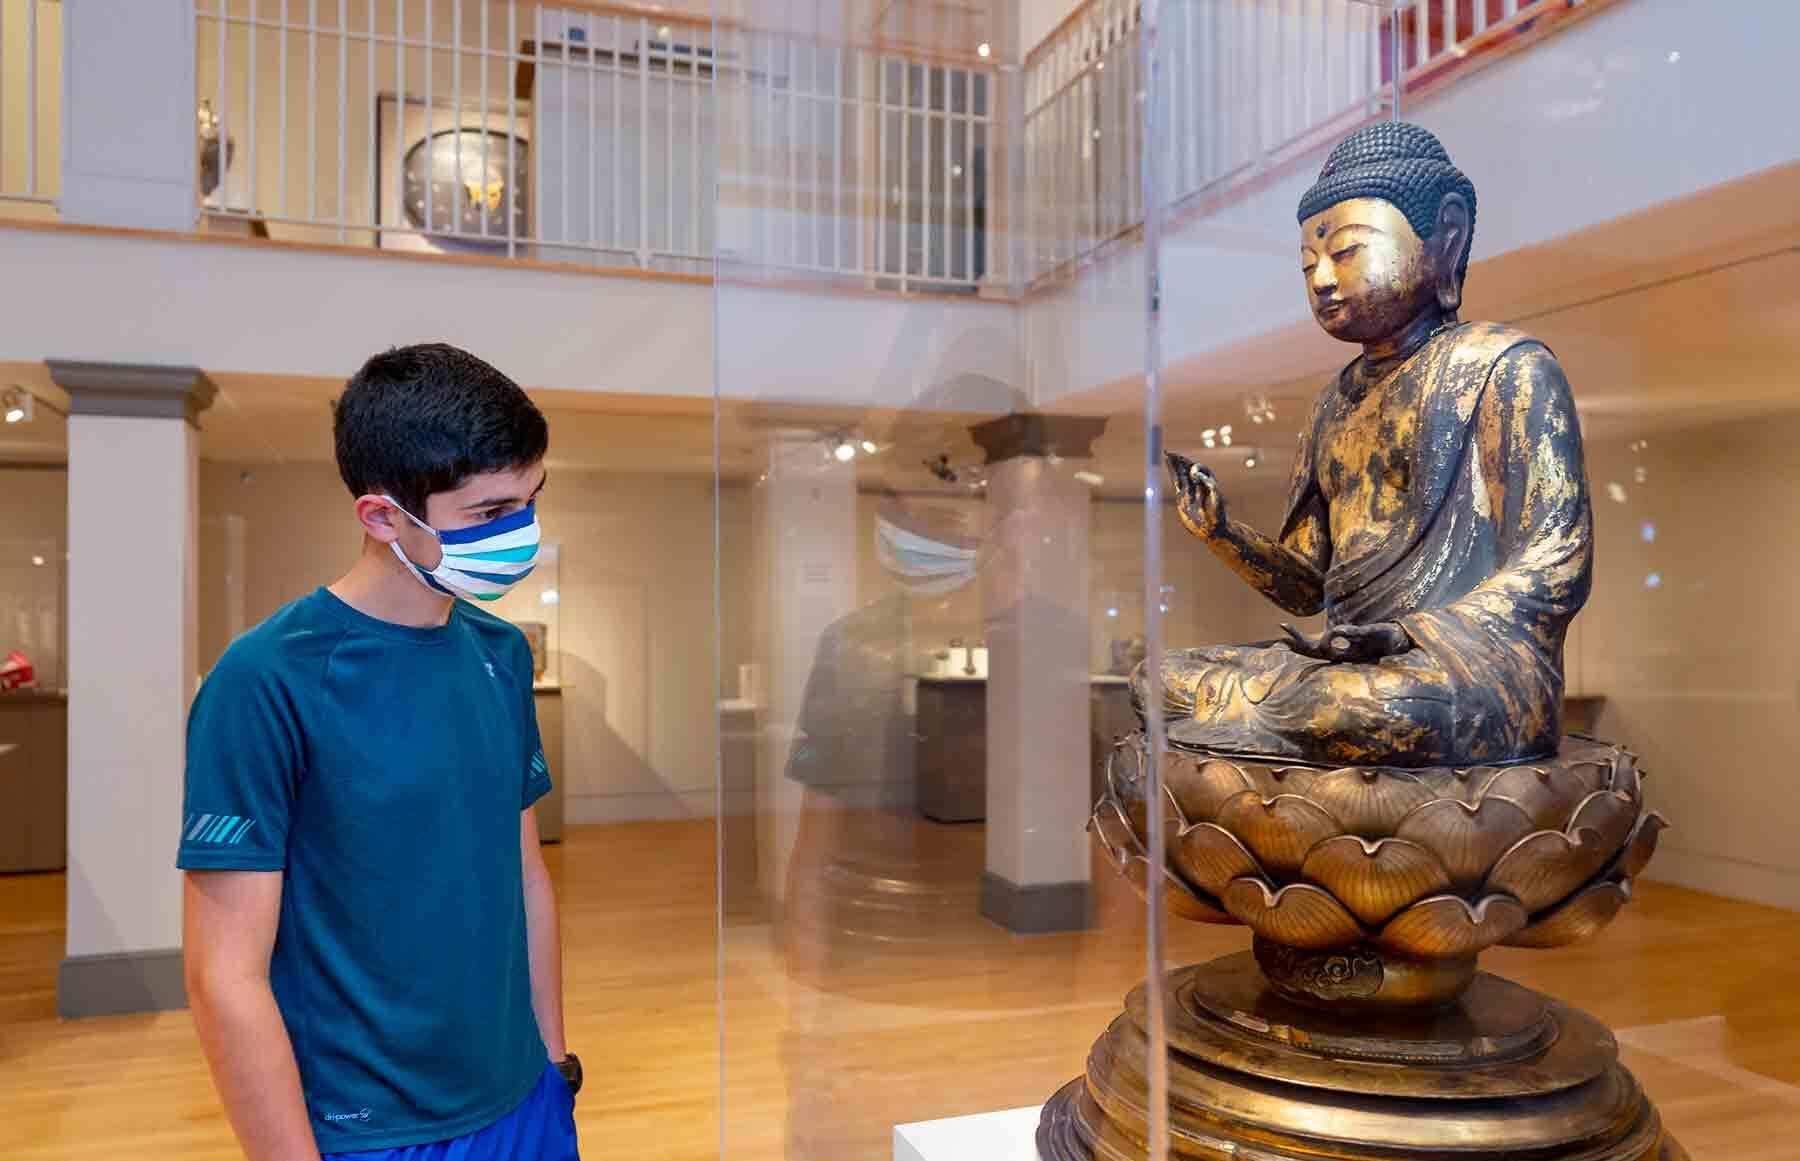 Julien Marrero, 14, enjoys wandering the museum by himself.